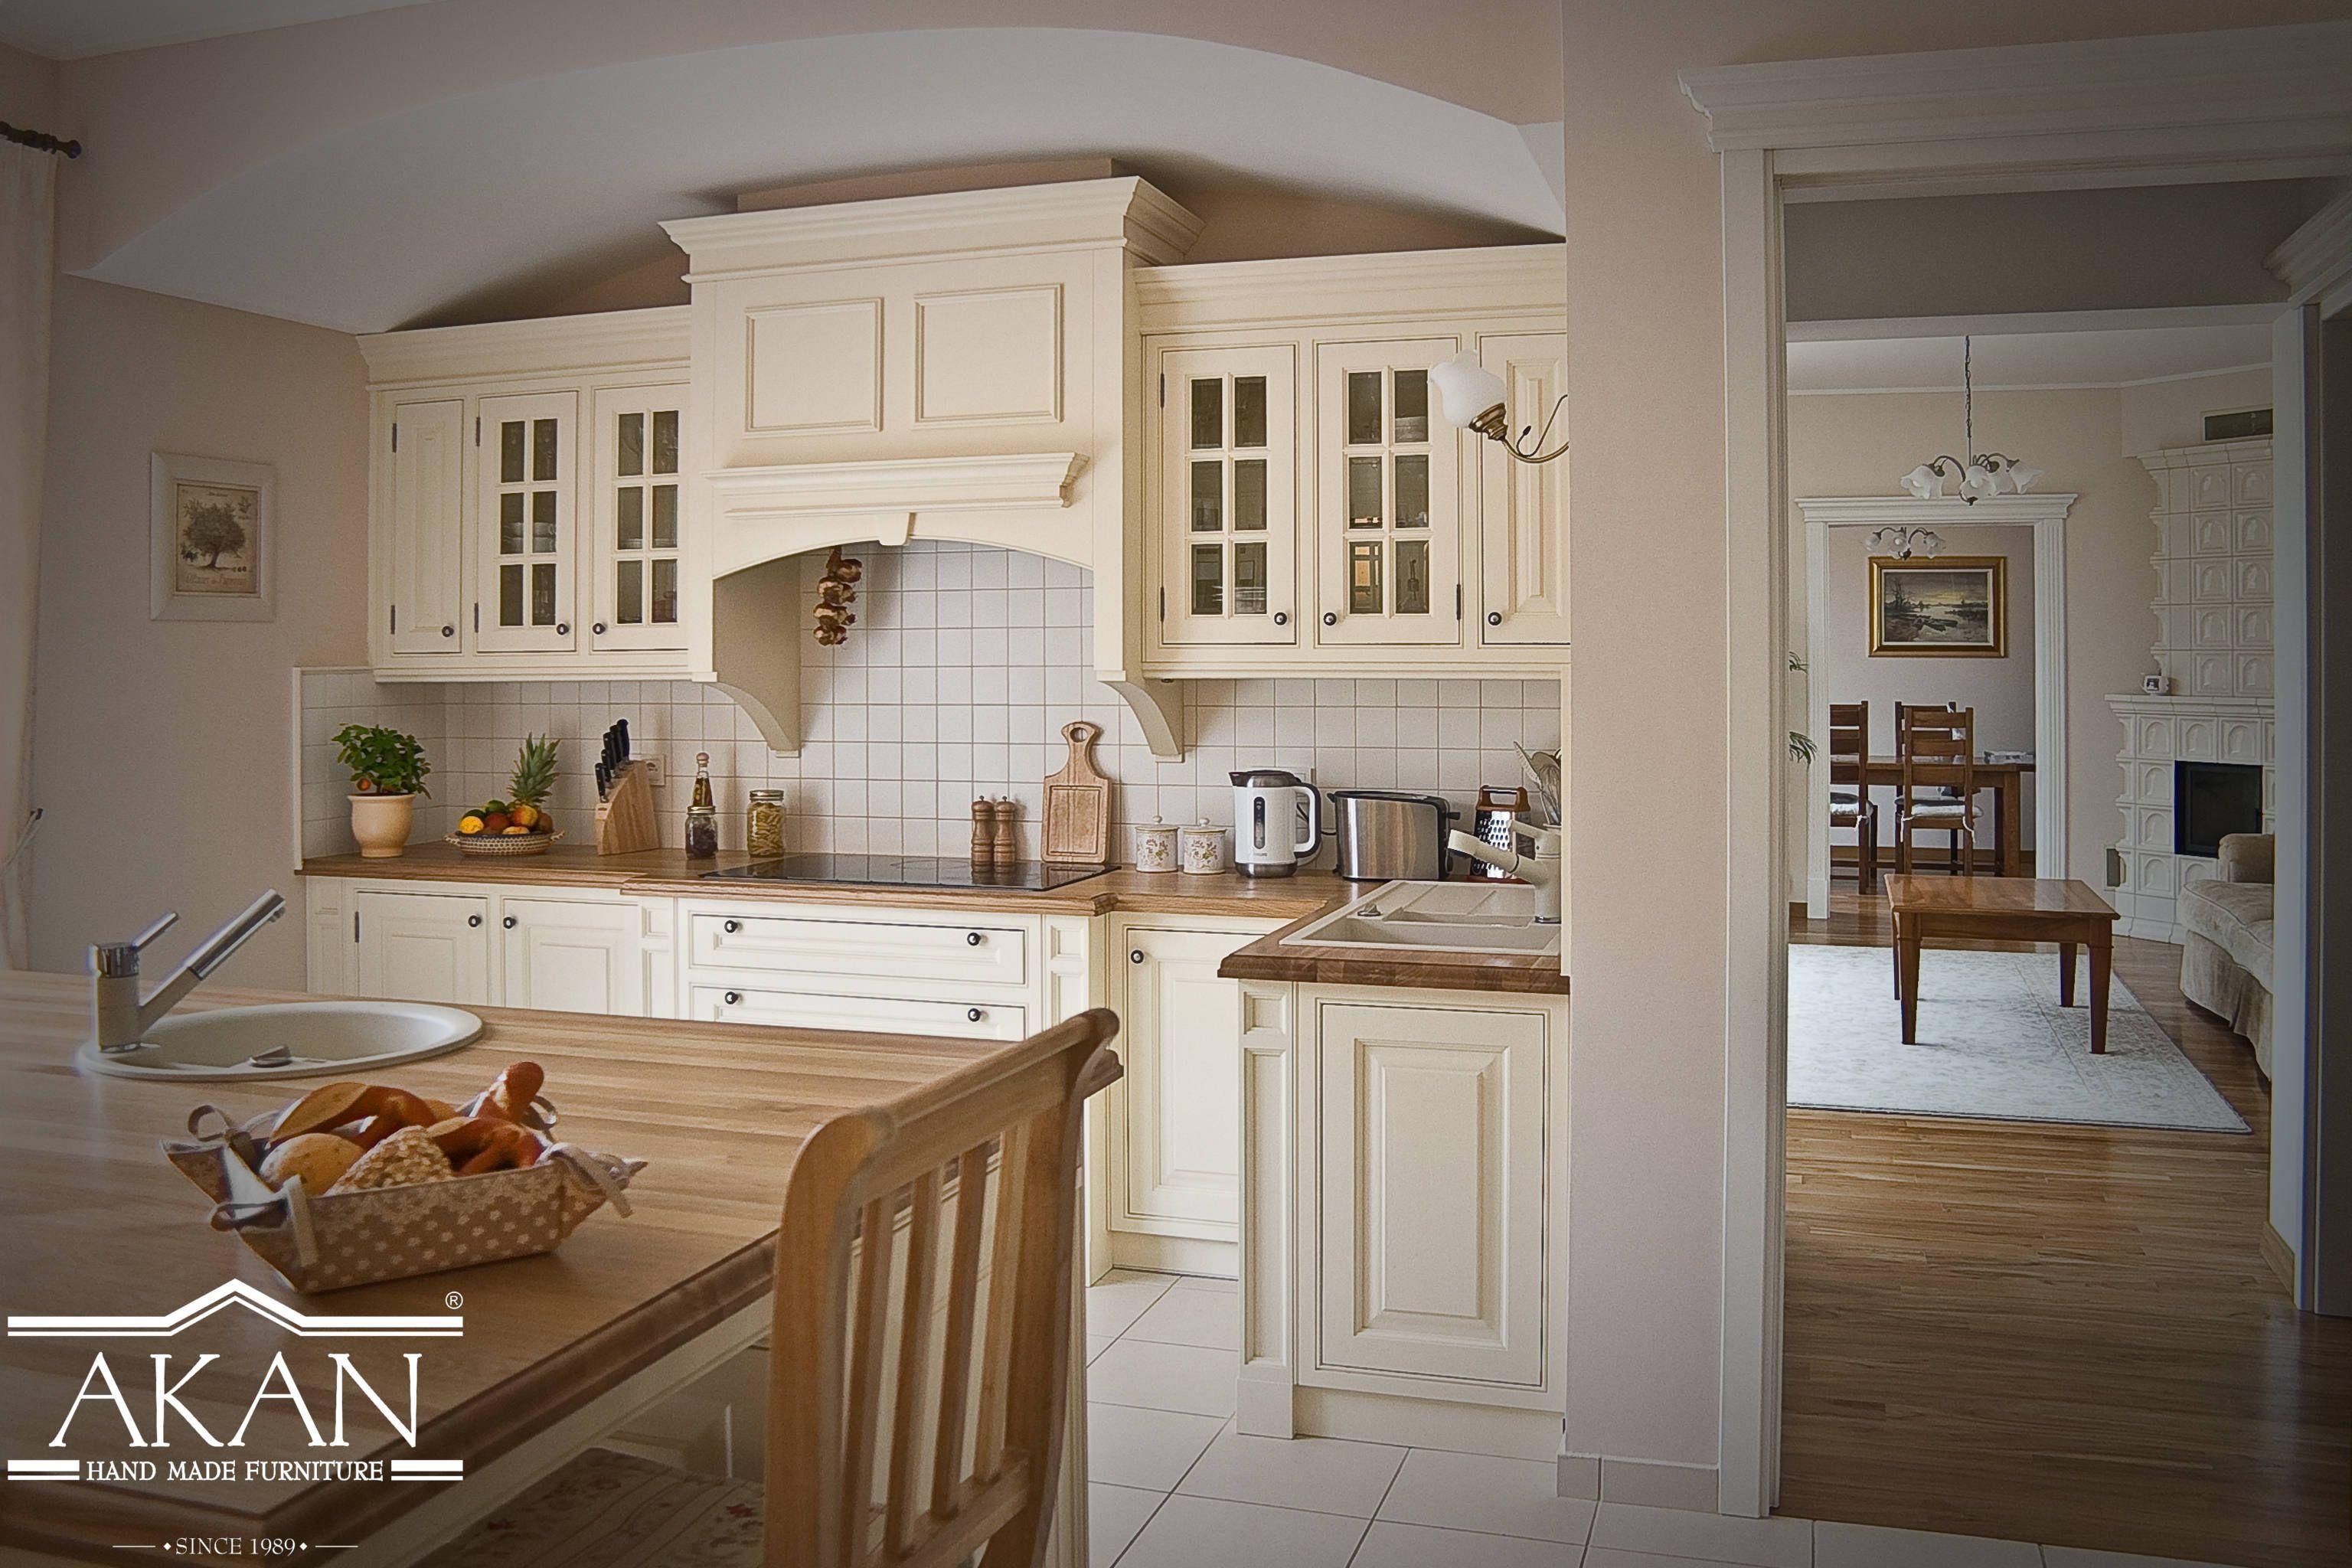 Piekna Klasyczna Zabudowa Kuchni Stanowisko Piecowe Kremowa Kuchnia Lite Drewno Akan Hand Made Furniture Cream K Kitchen Kitchen Furniture Furniture Making